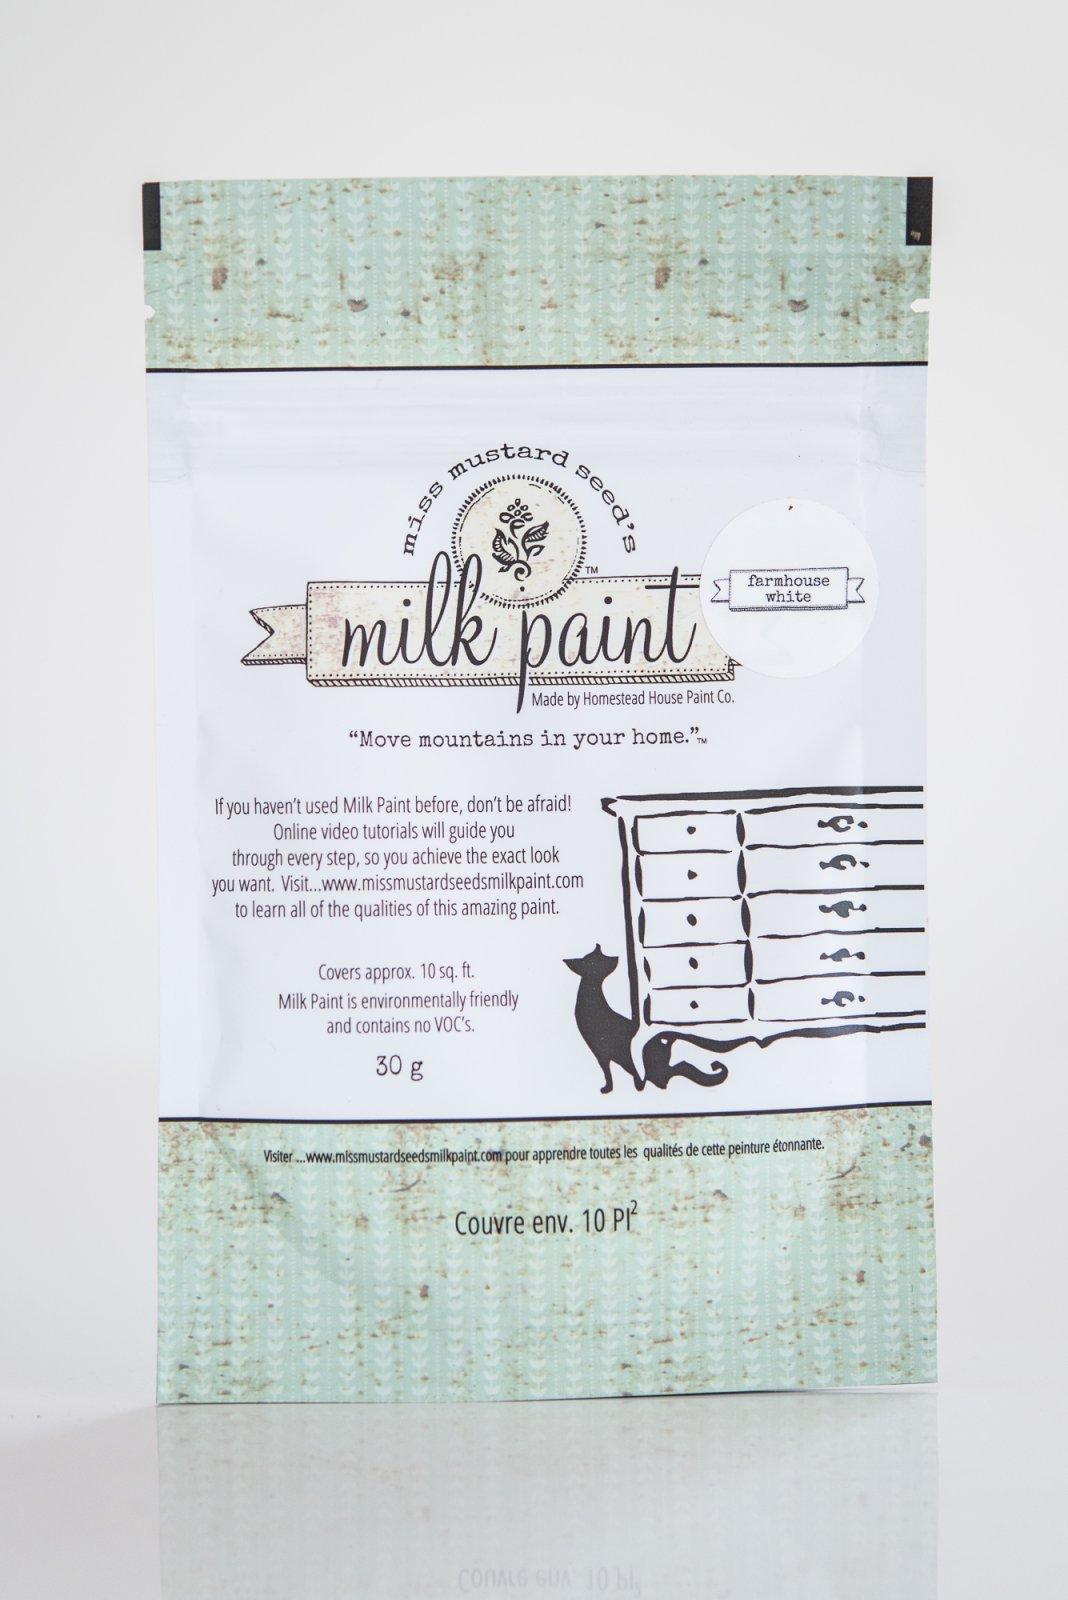 Farmhouse White Miss Mustard Seed Milk Paint Tester 30g